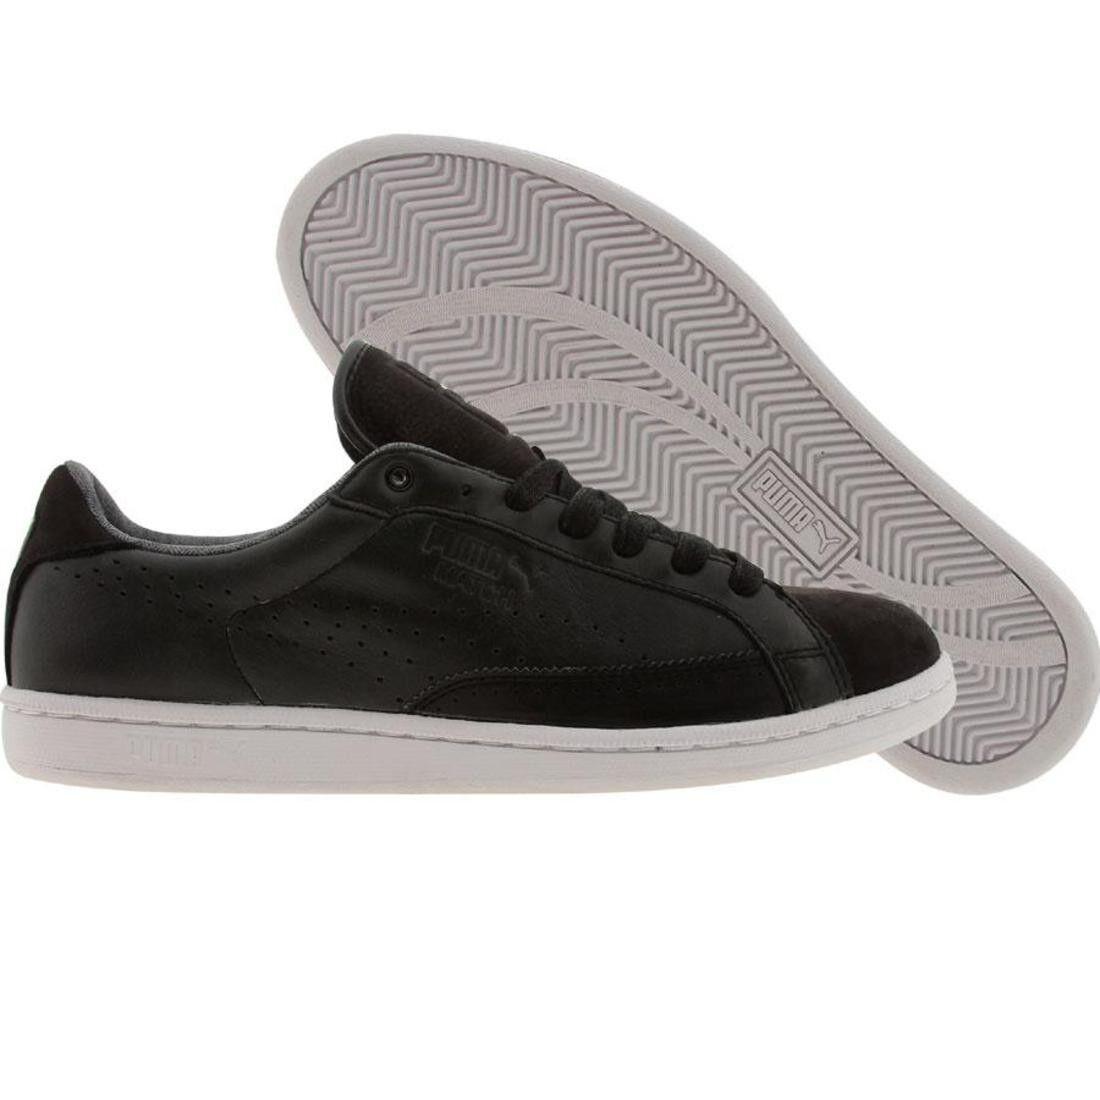 $90.00 Puma Match Pro (black / white) 350389-02